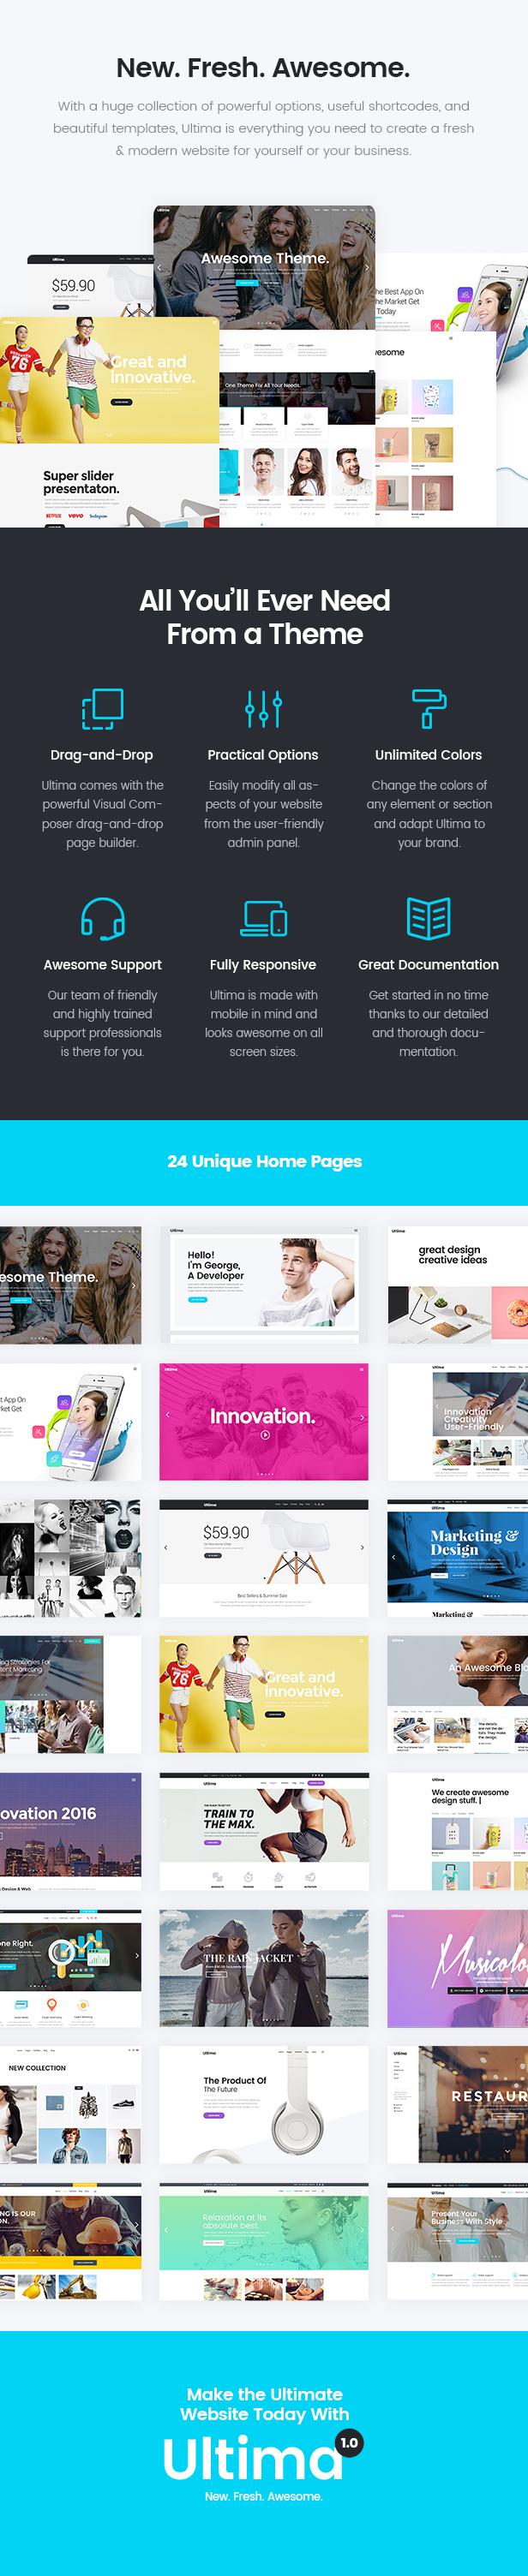 WordPress theme Ultima - A Multi-Purpose WordPress Theme (Business)